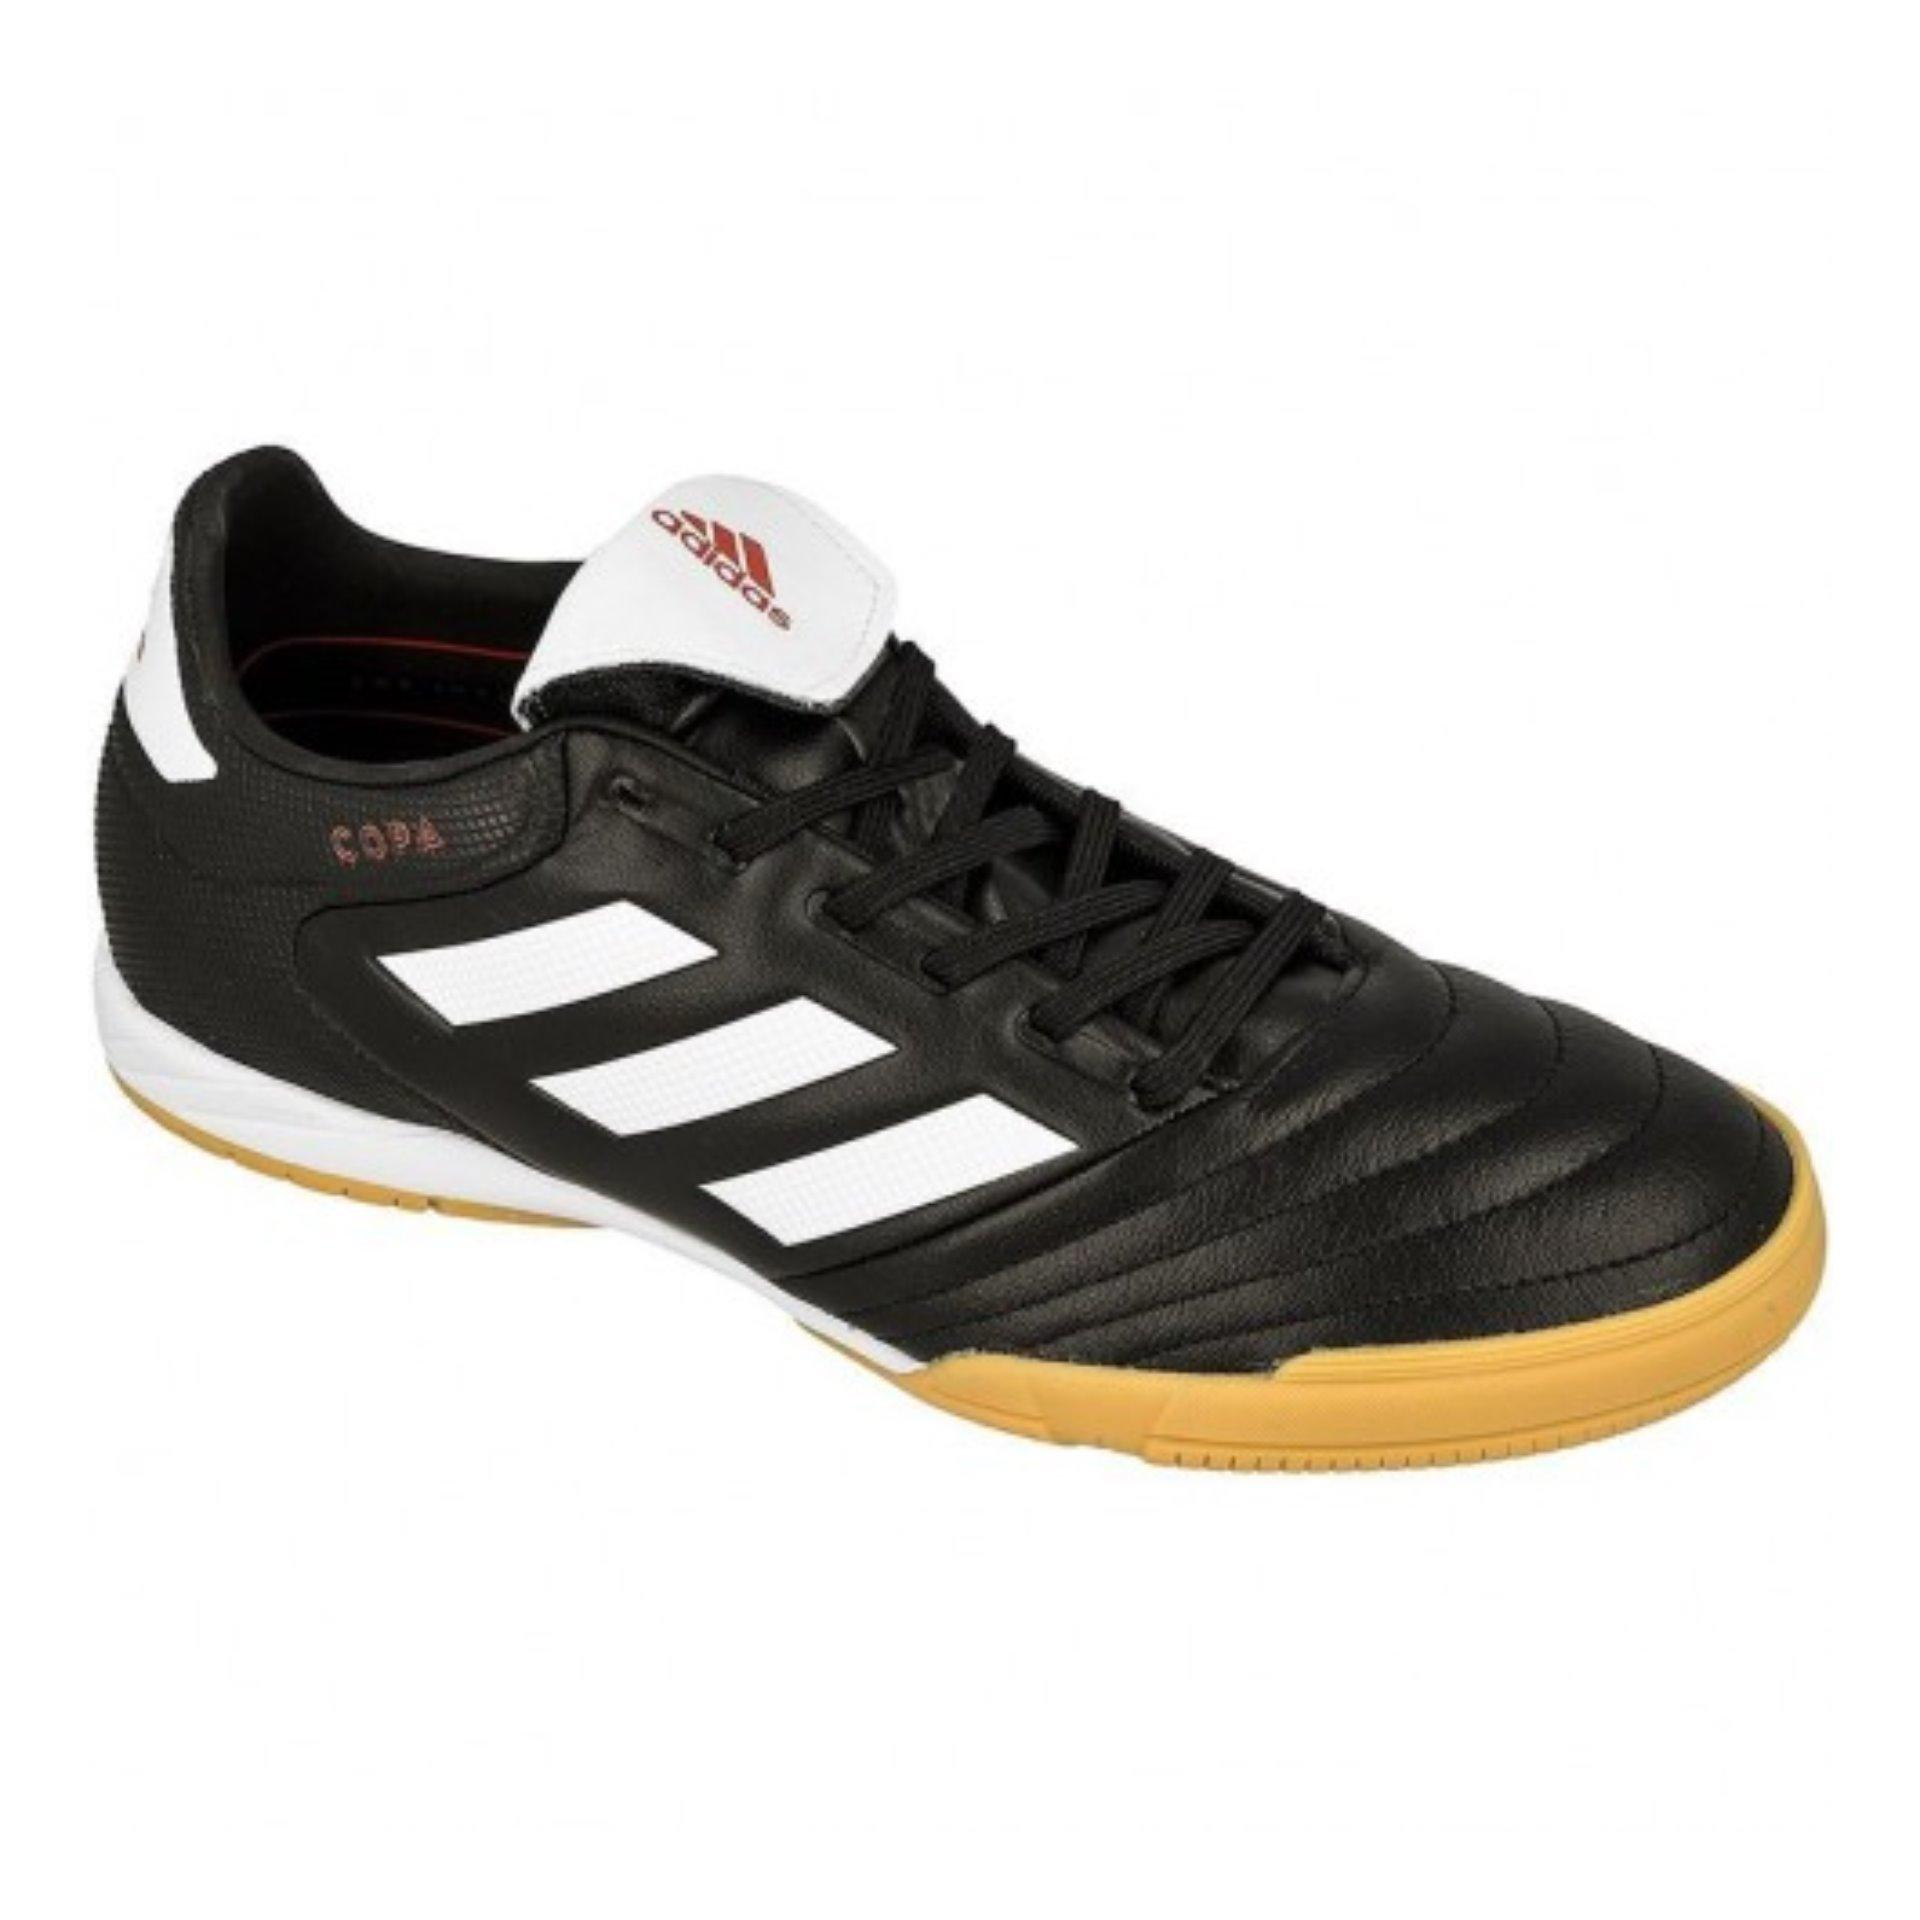 Harga Adidas Sepatu Futsal Copa 17 3 In Bb0851 Hitam Asli Adidas